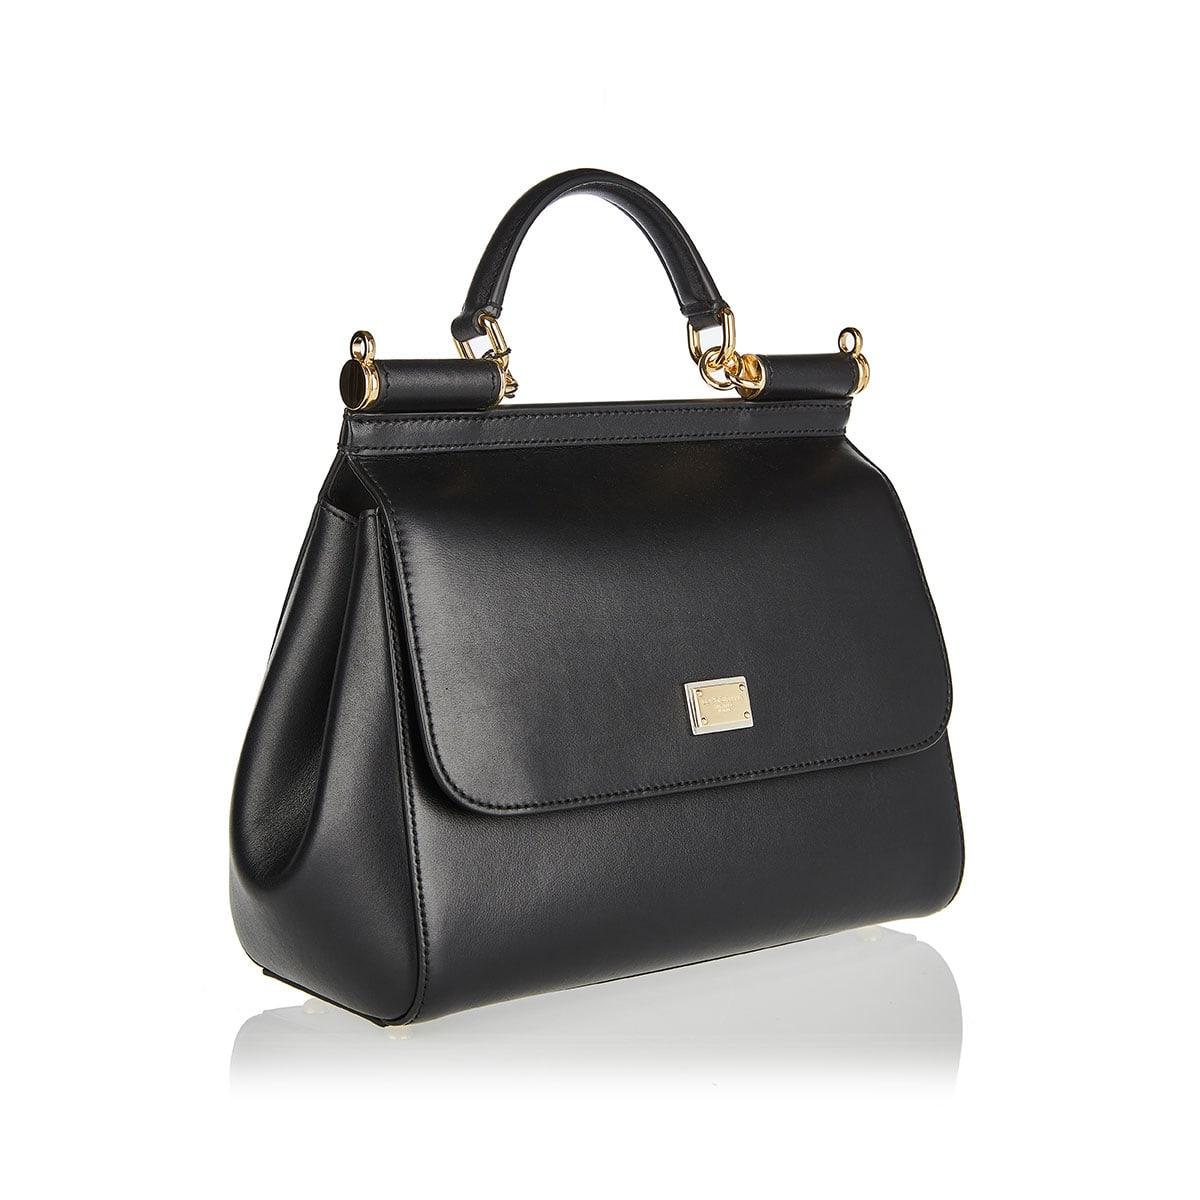 Sicily medium top-handle bag